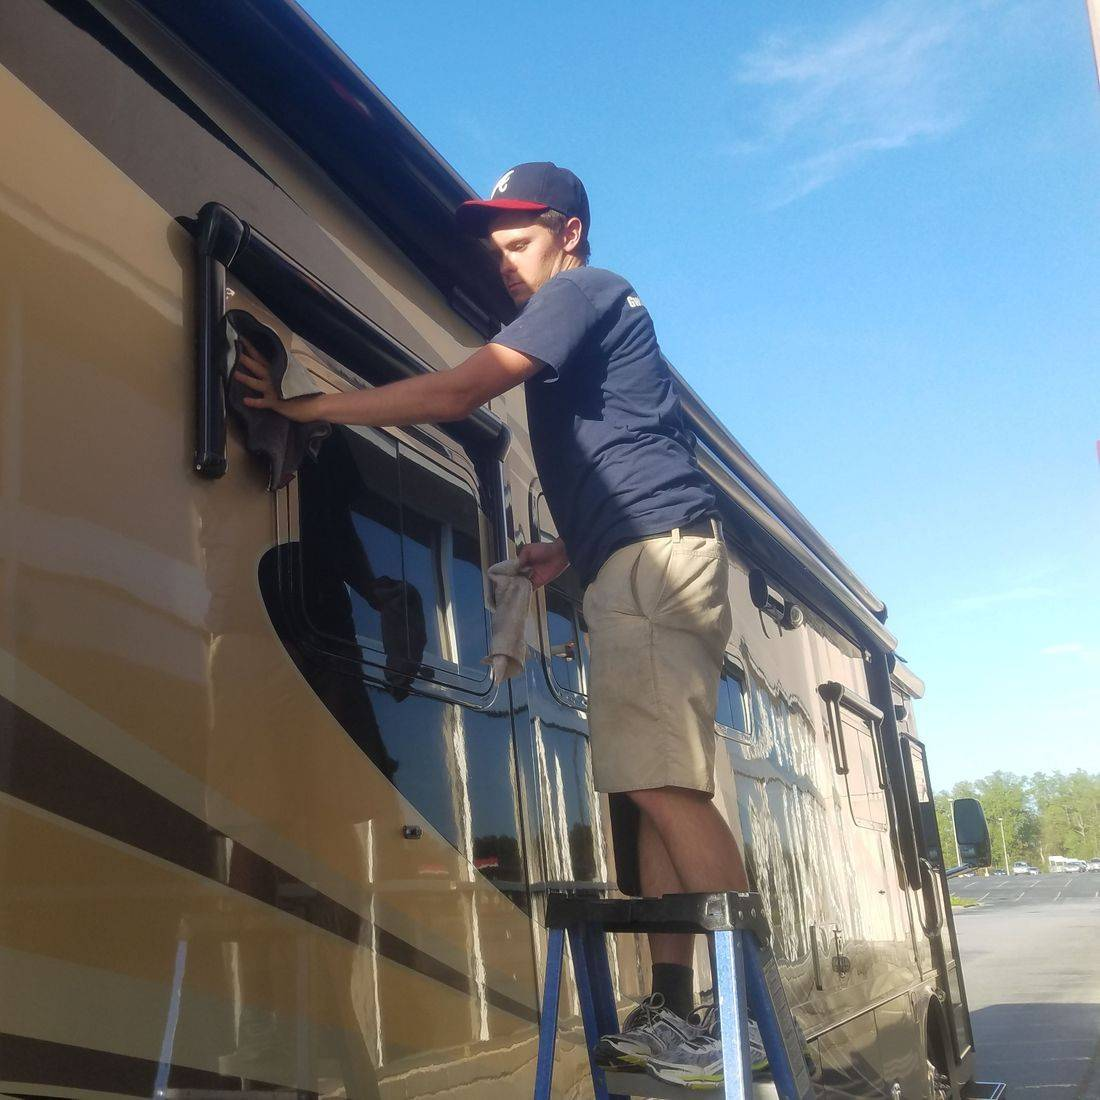 mobile car detailing, rv paint correction, Gwinnett Auto Appearance